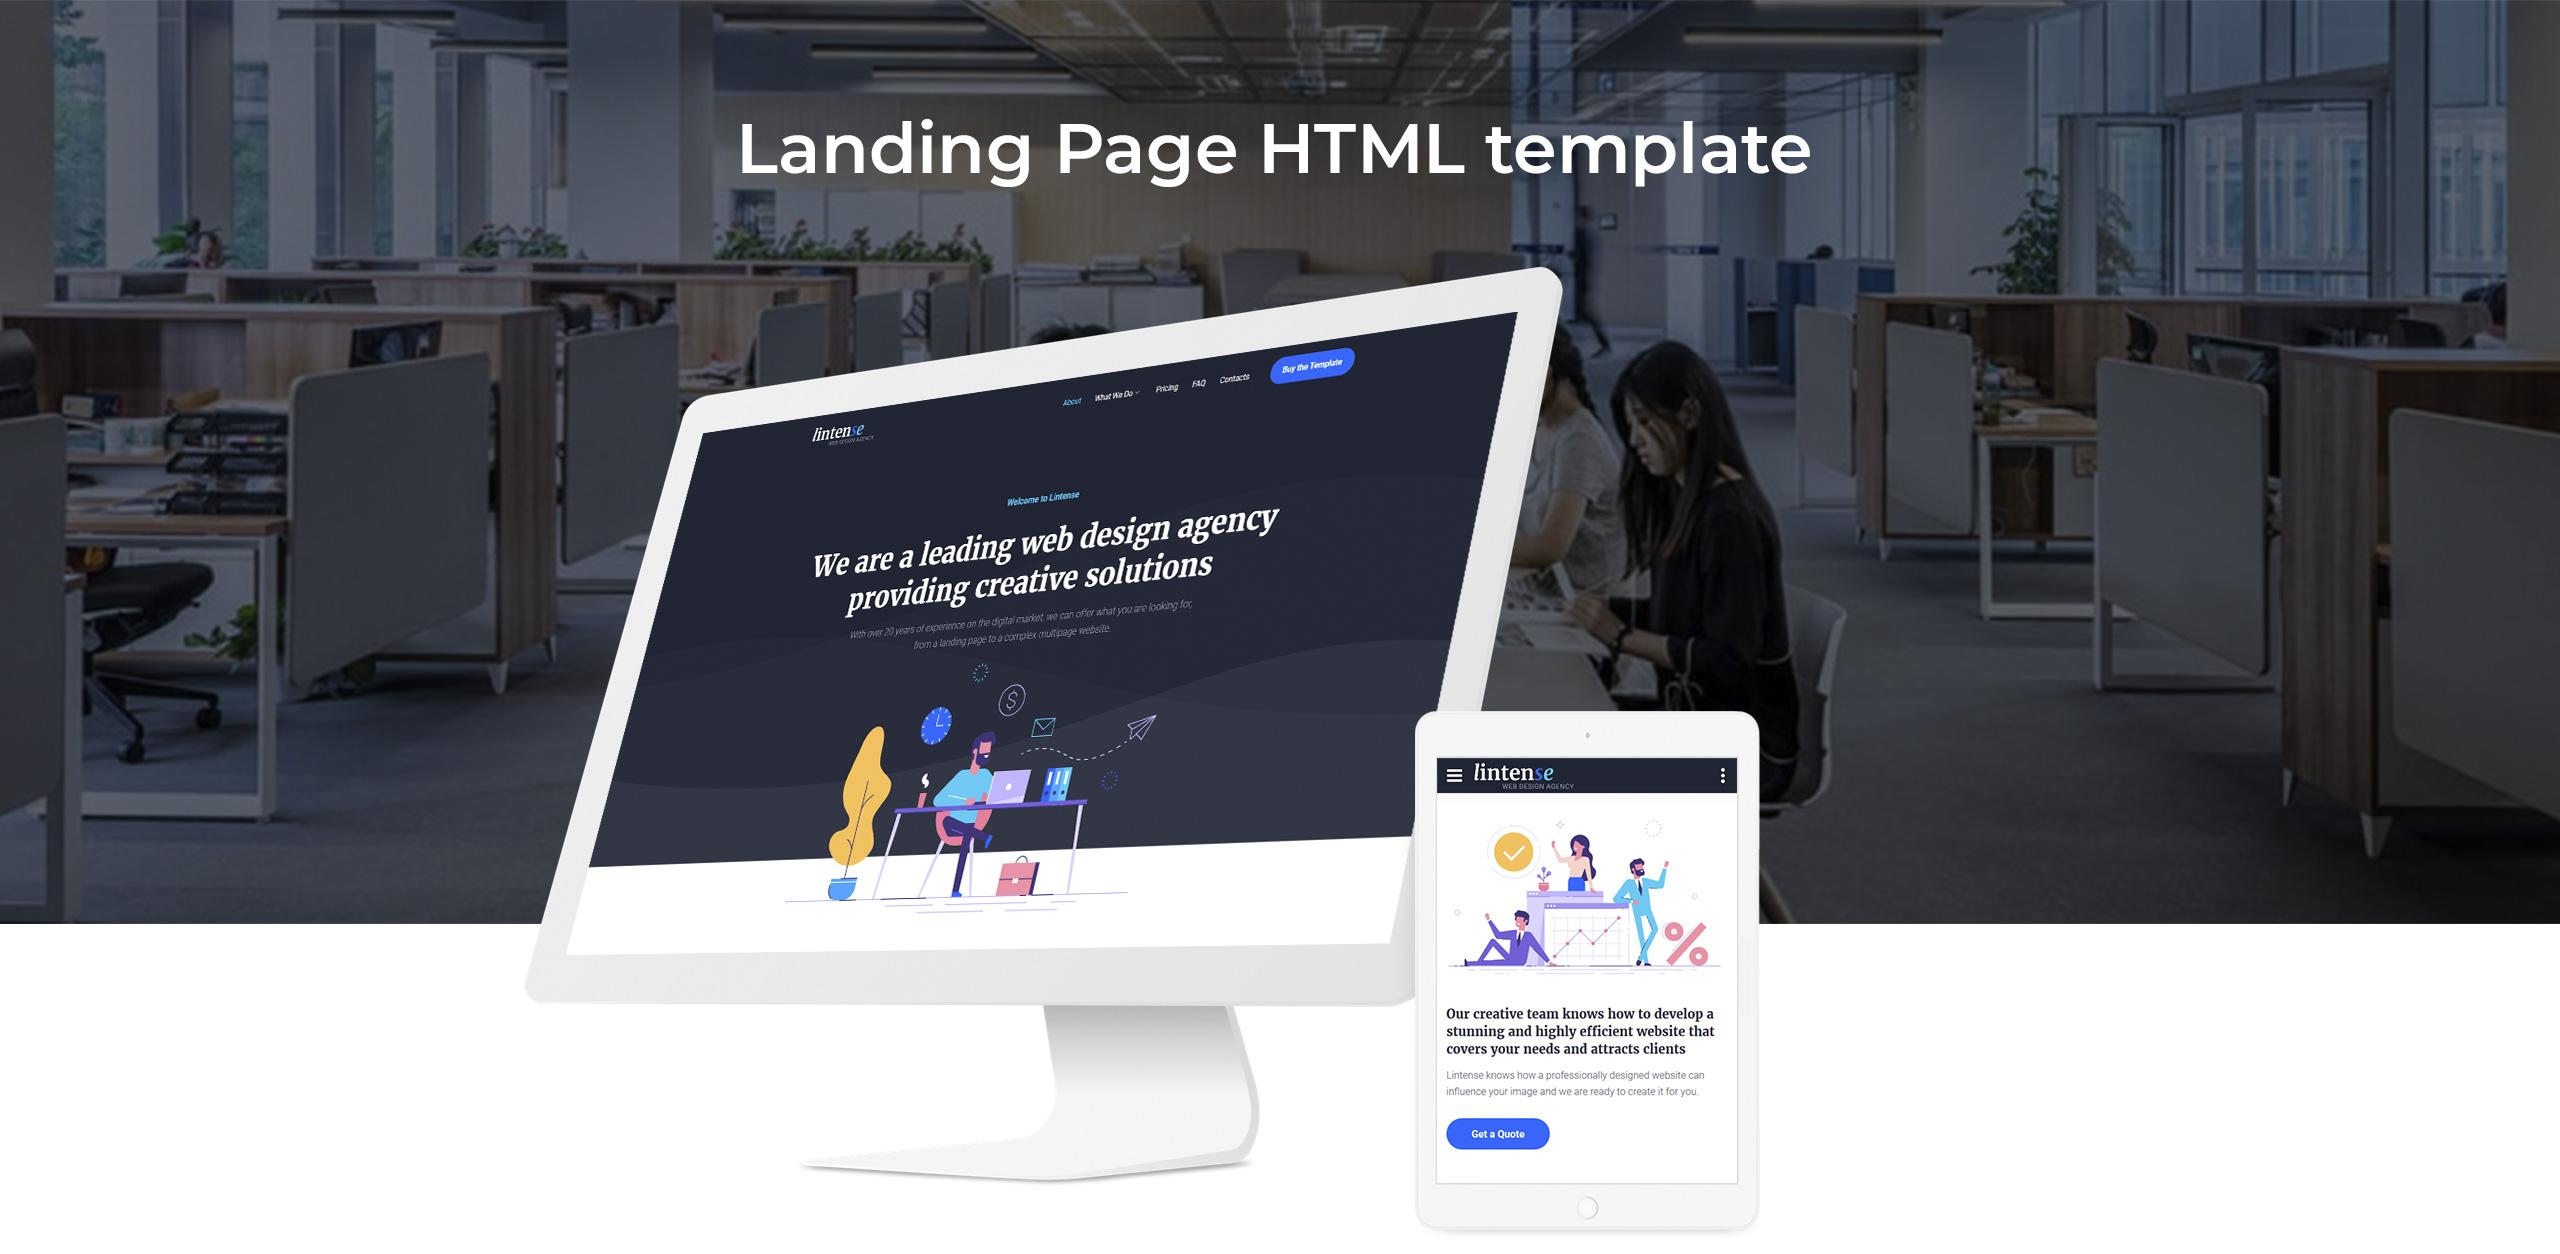 Lintense Corporate - Web Design Agency Creative HTML Landing Page Template